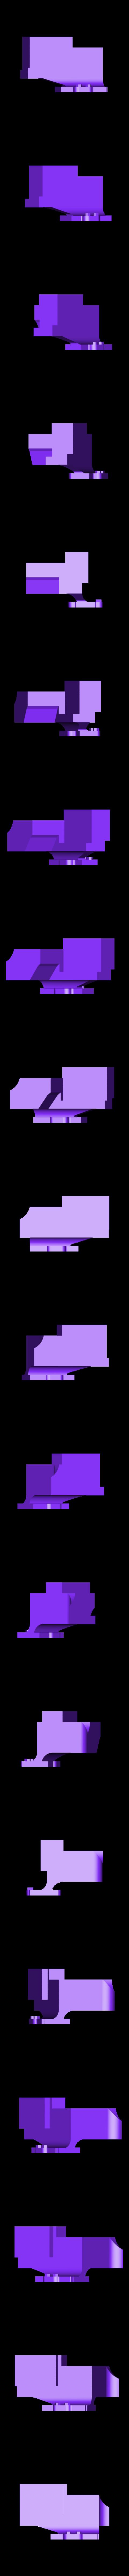 MakerBot_-_Rear_Engine-_SCALED-6.STL Download free STL file 4-8-8-4 Big Boy Locomotive • 3D printer object, RaymondDeLuca